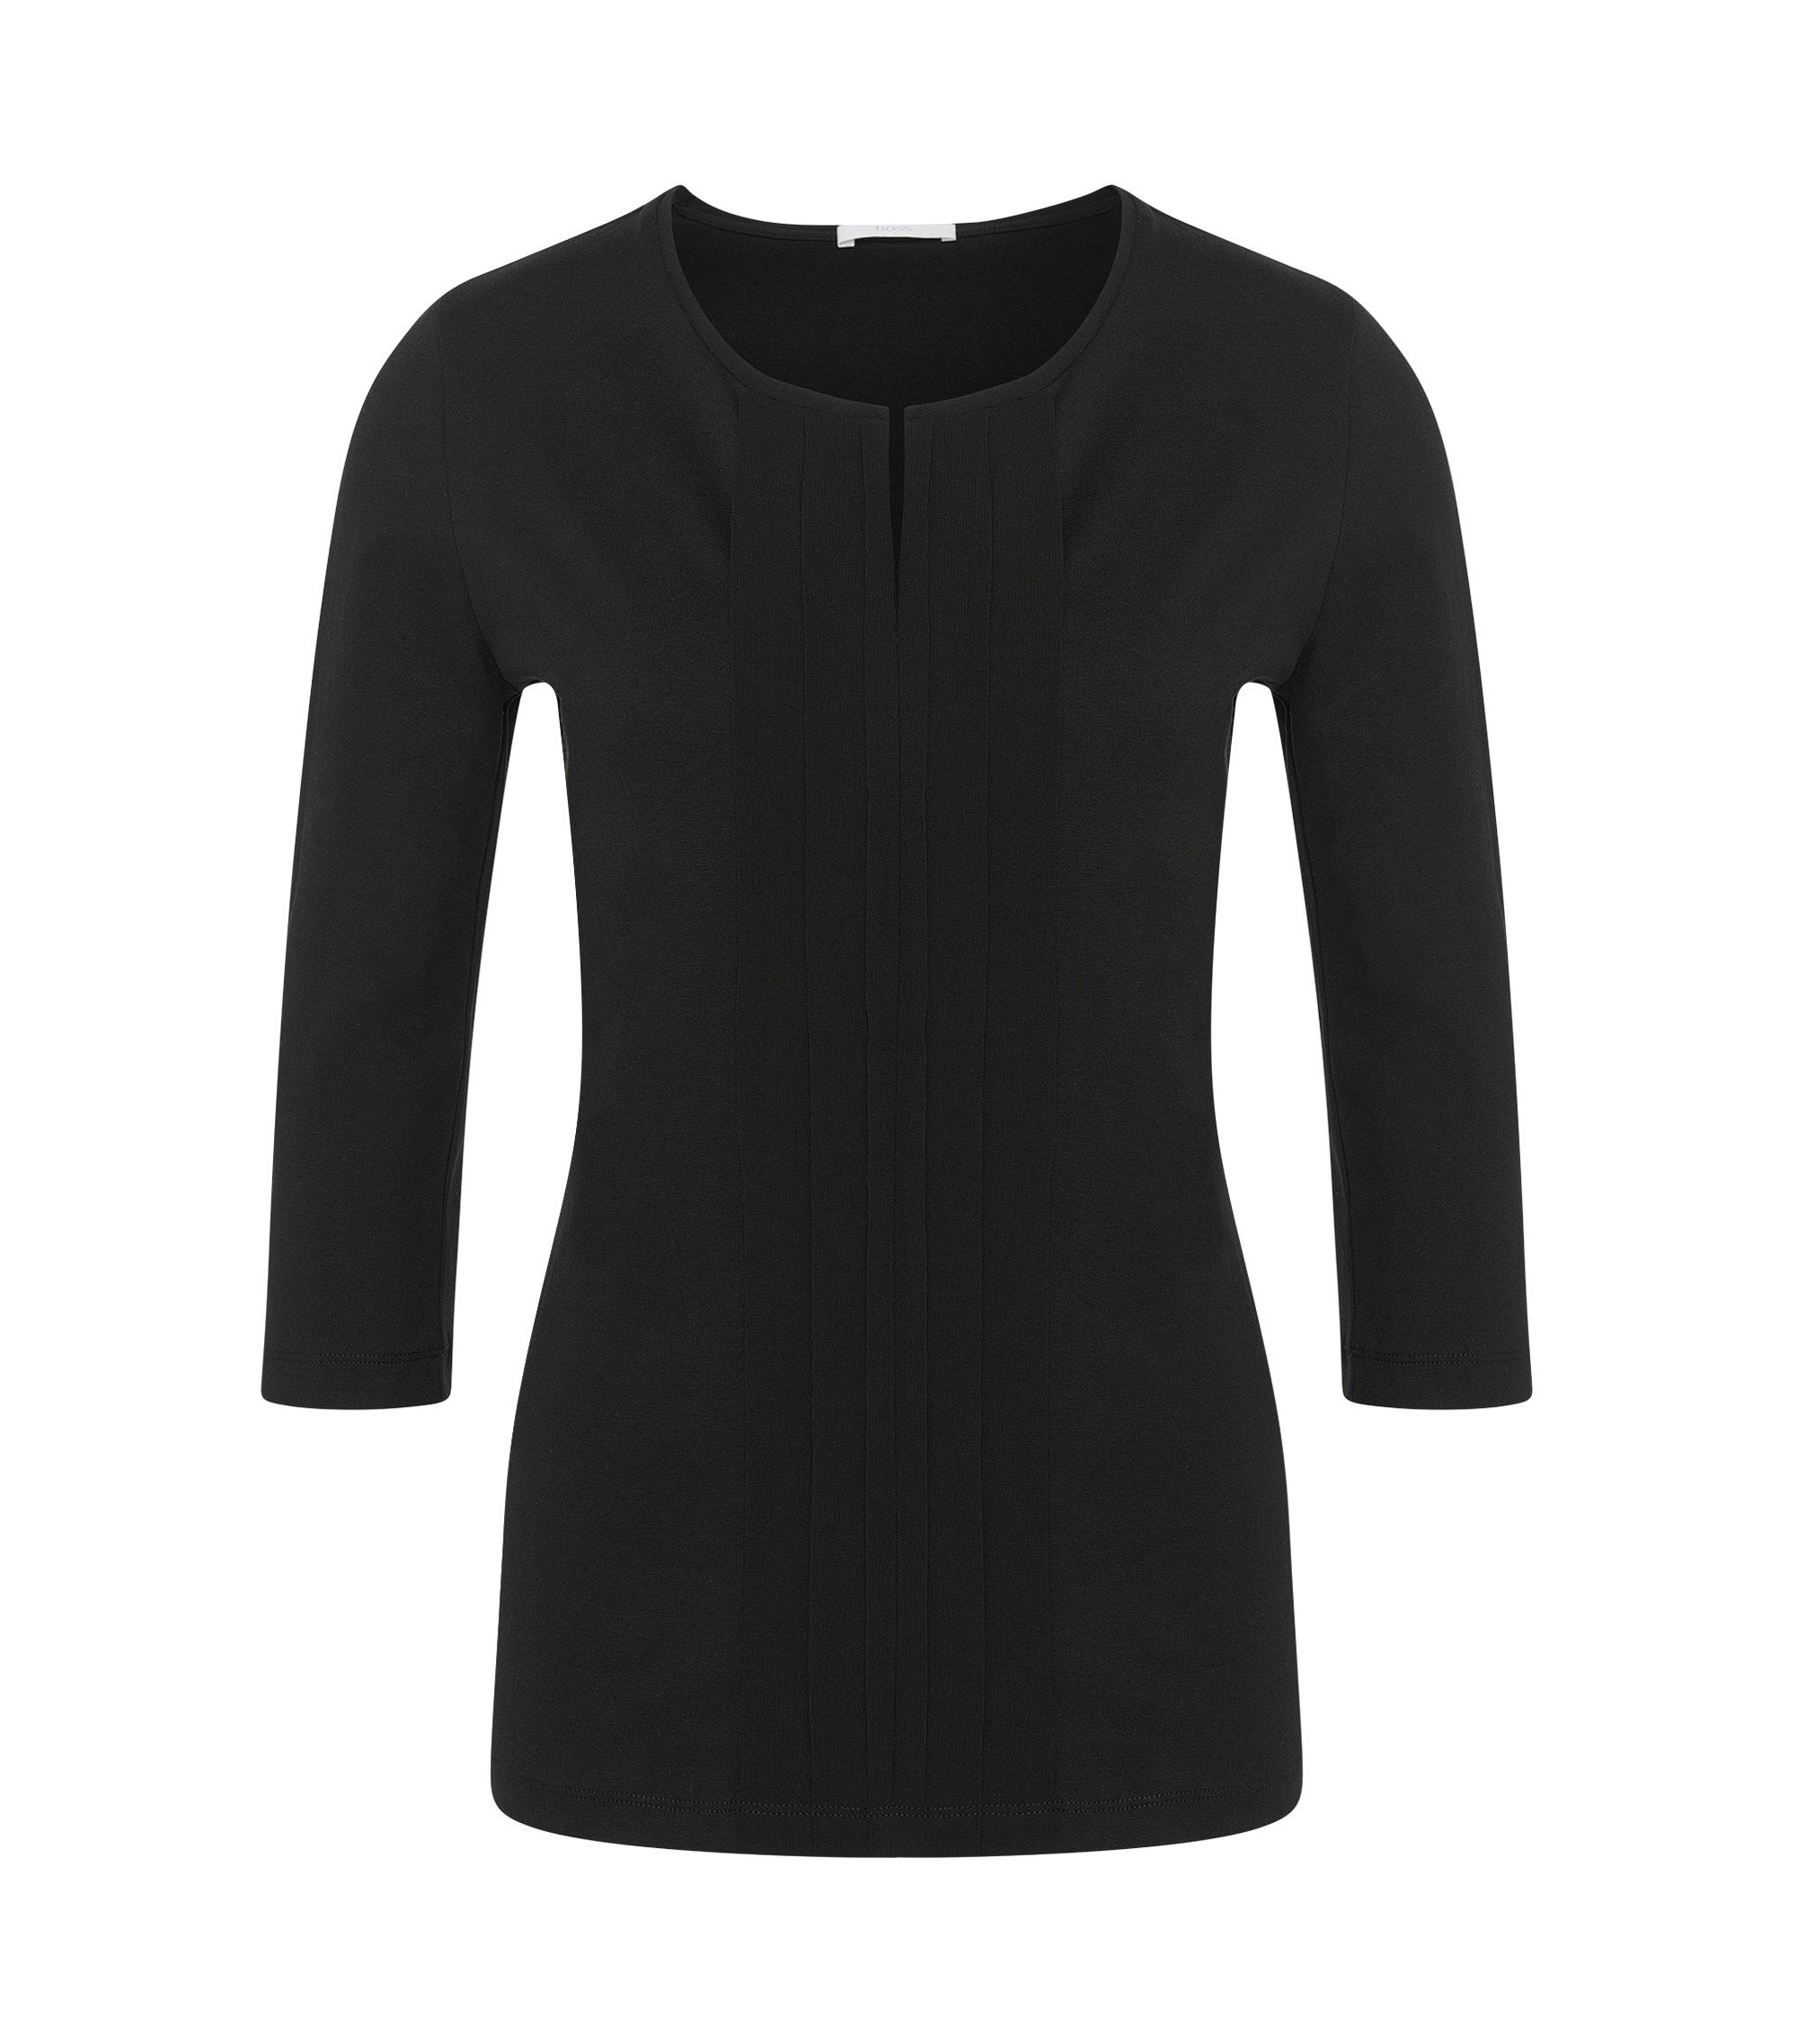 Jerseytop met plissédetail, Zwart